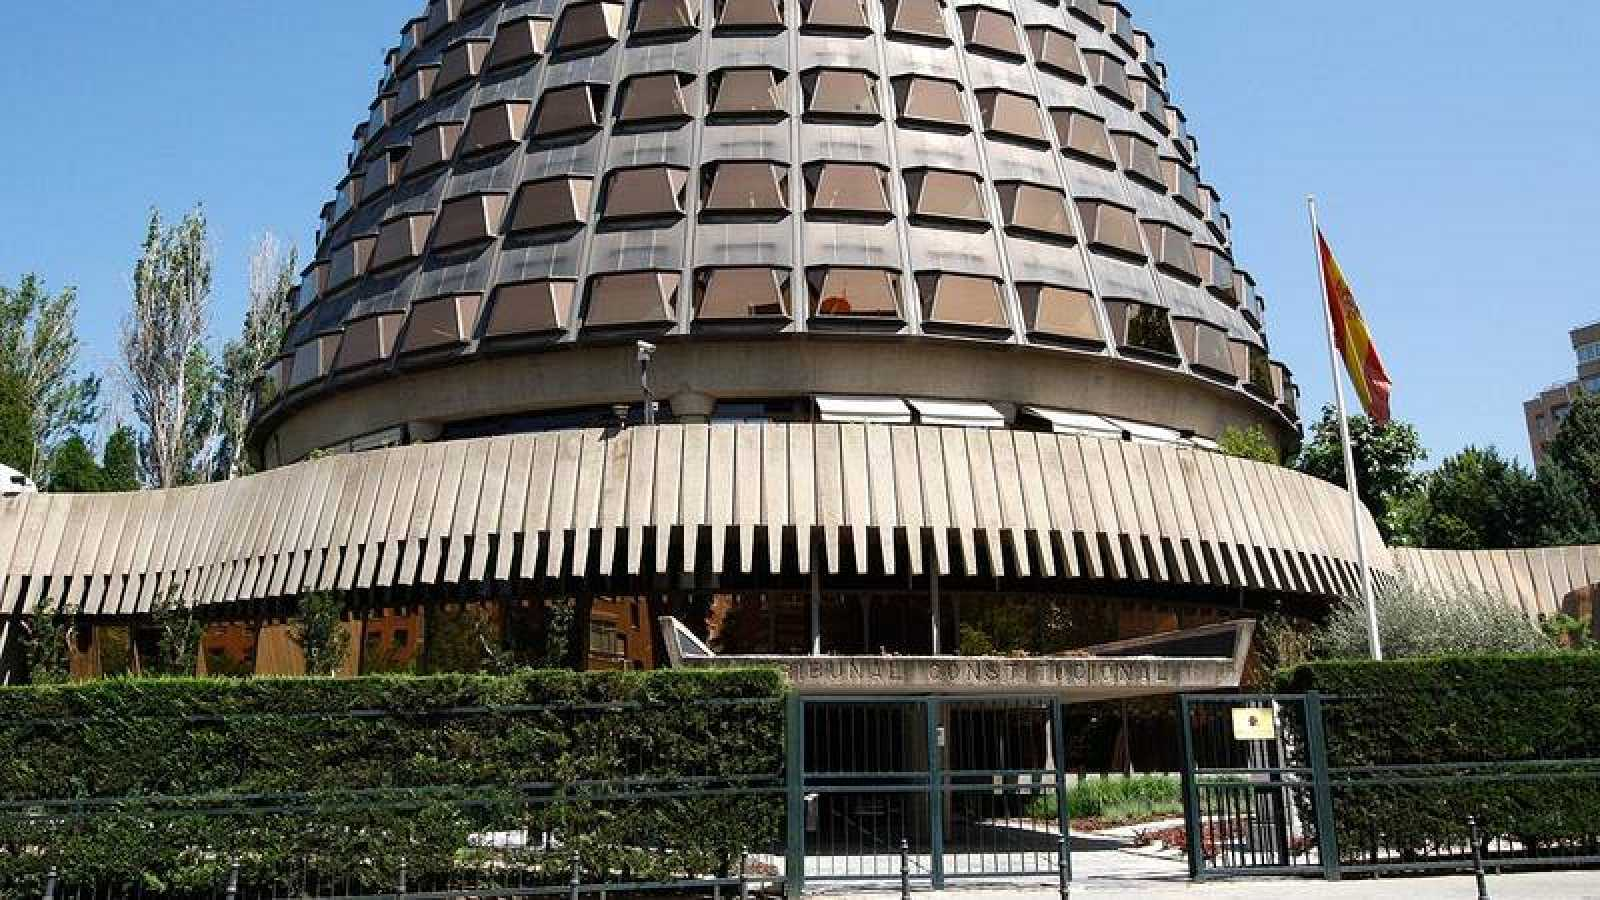 Edificio sede del Tribunal Constitucional en la calle Domenico Scarlatti de Madrid.